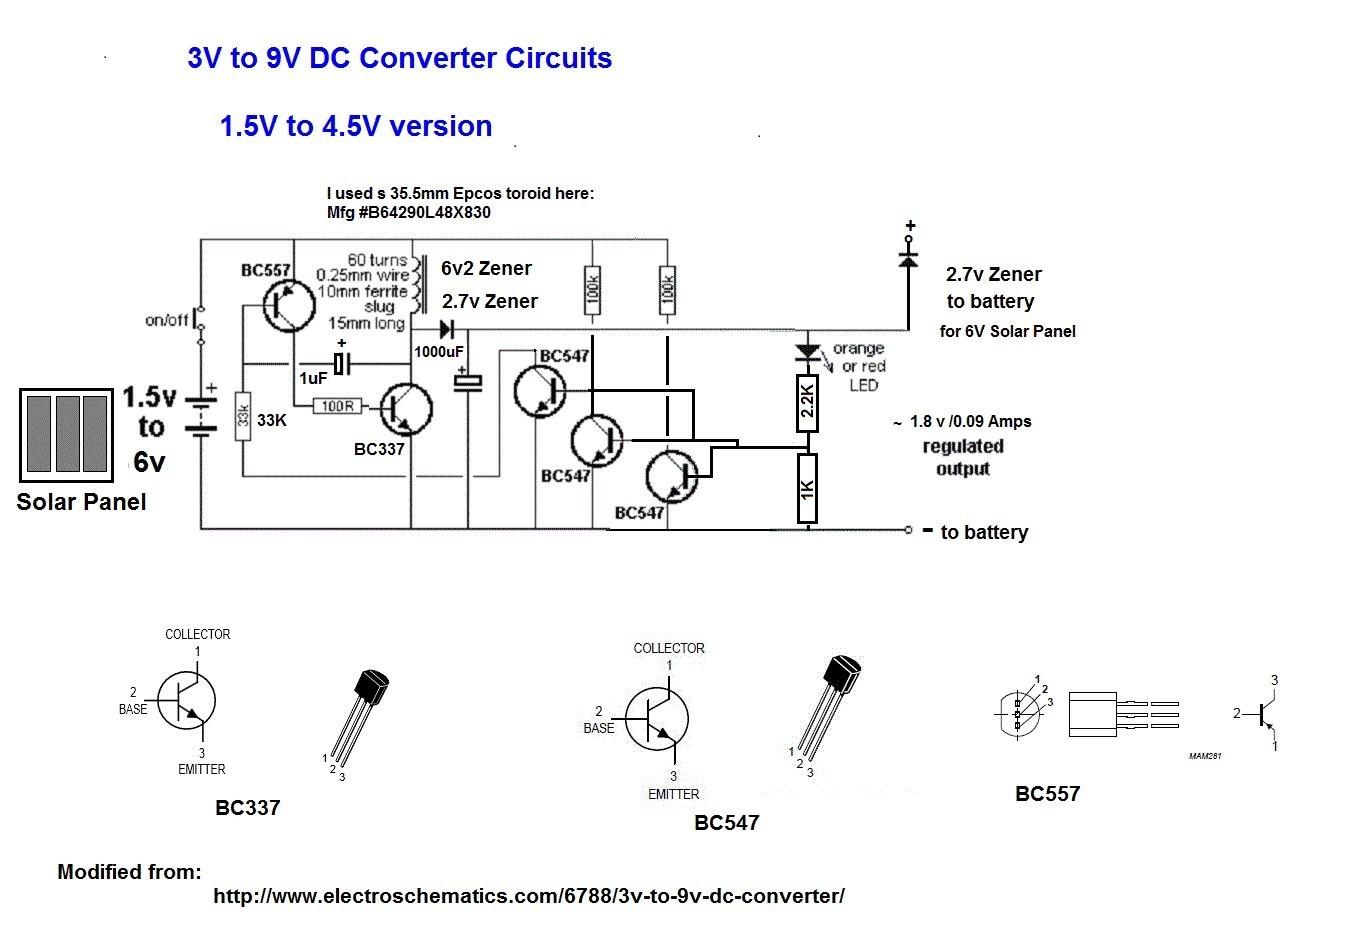 Battery Diagram Circuit New 34 Inspirational Battery Diagram Circuit Free Diagram Template